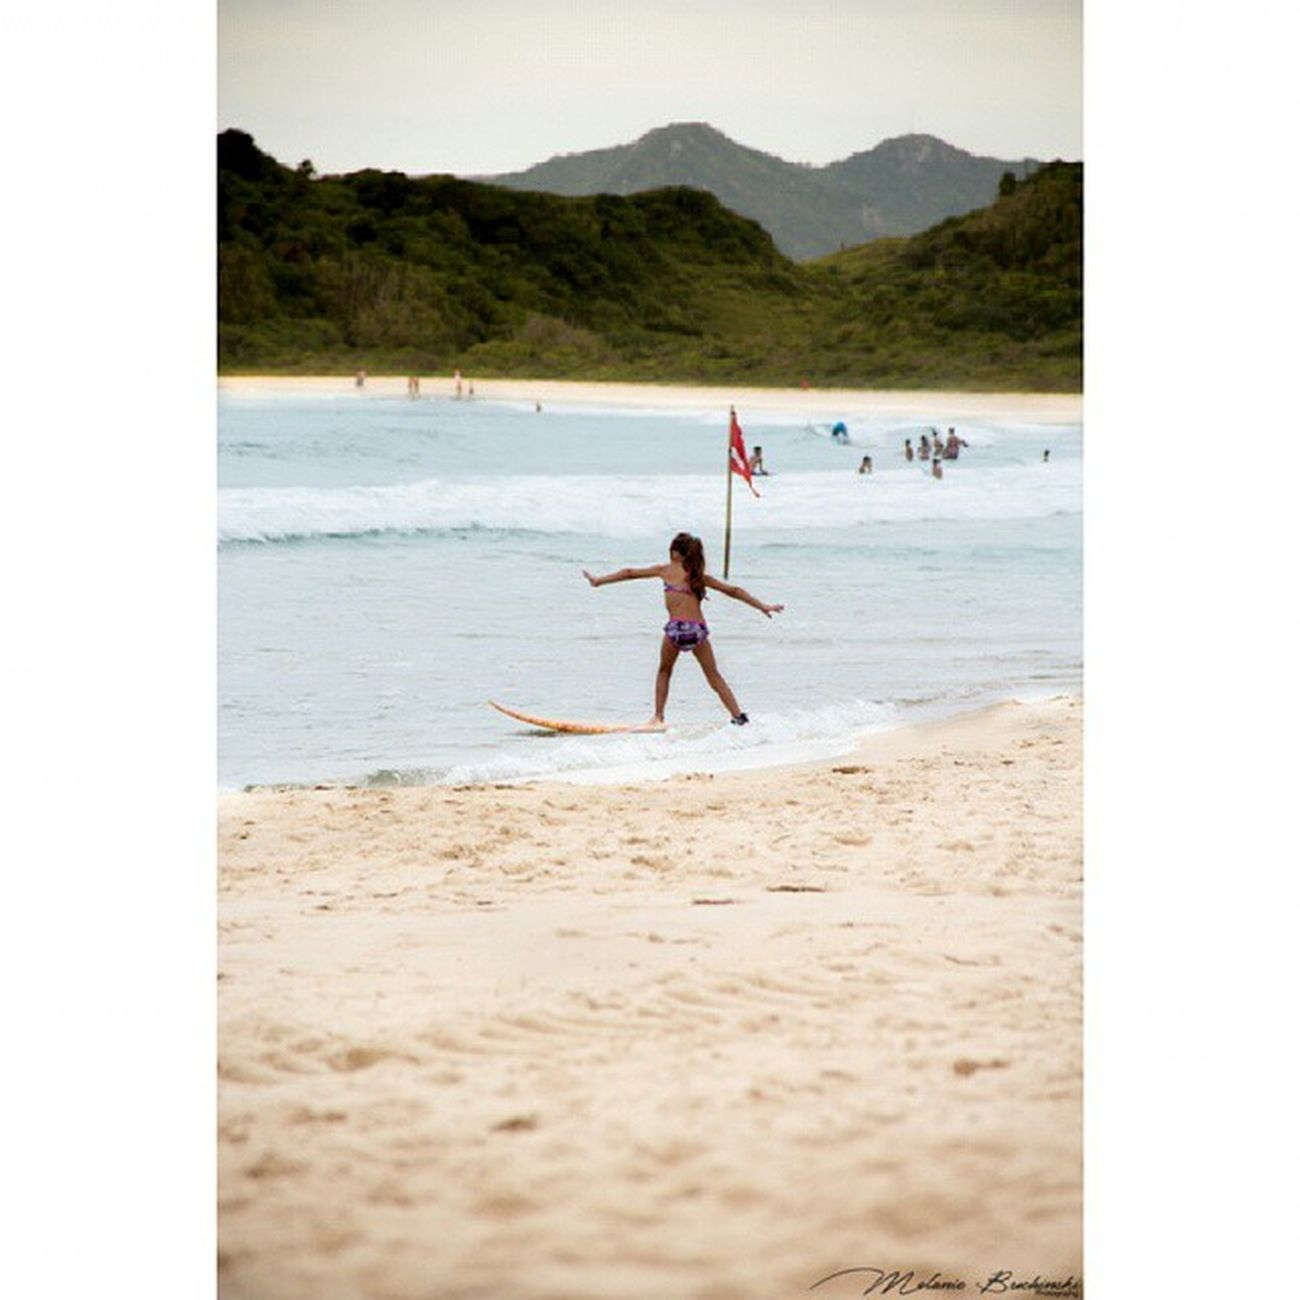 Aprendirndo Surf! Photoshoot Photography Canon Child Girl Surf Ocean Sea Sand Playa Bombinhas Brasil Travel InstaSize